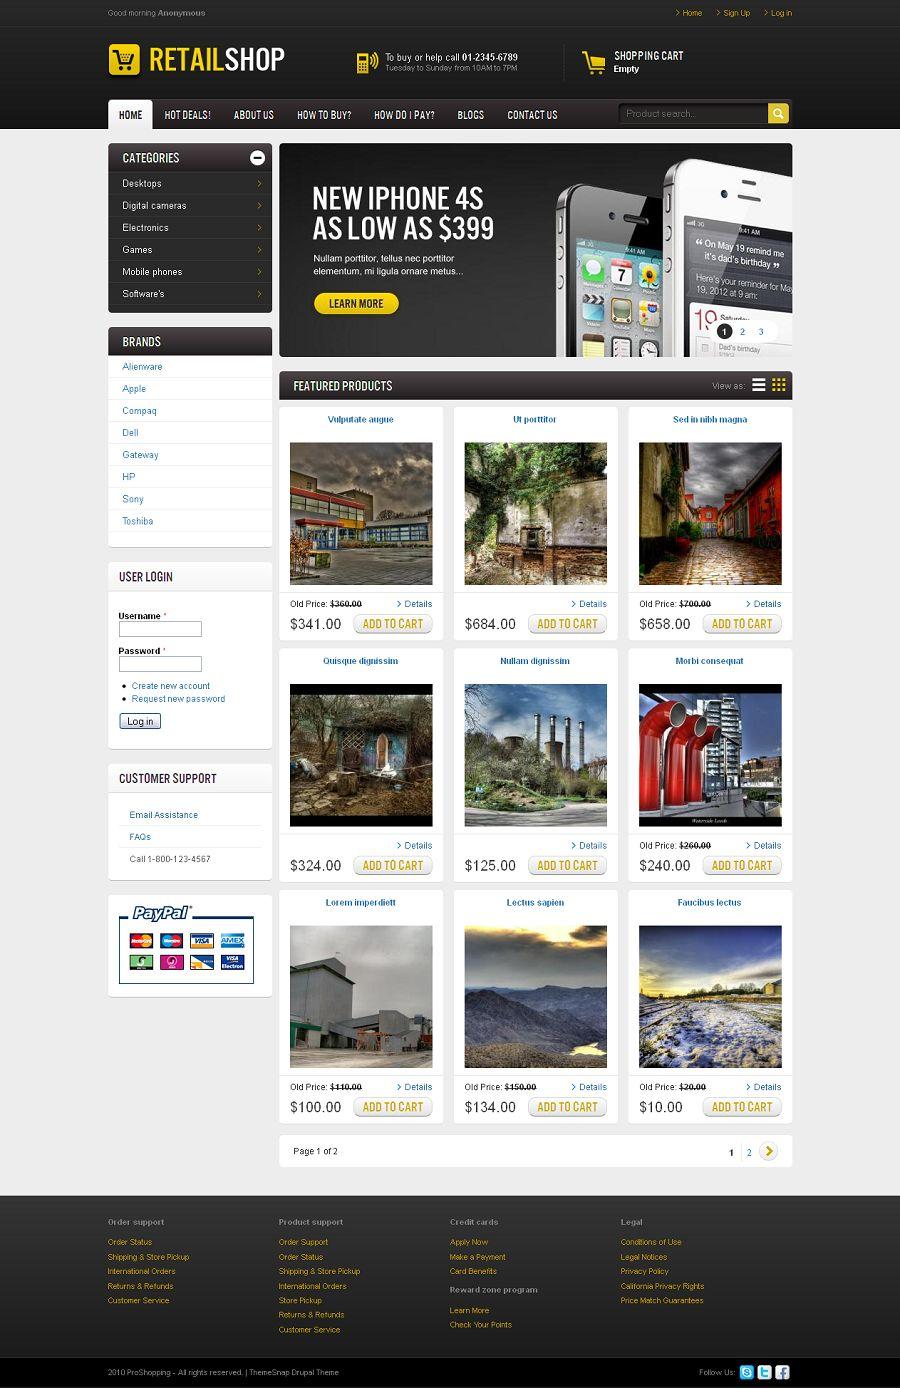 Retail Shop - Premium WordPress eCommerce Template